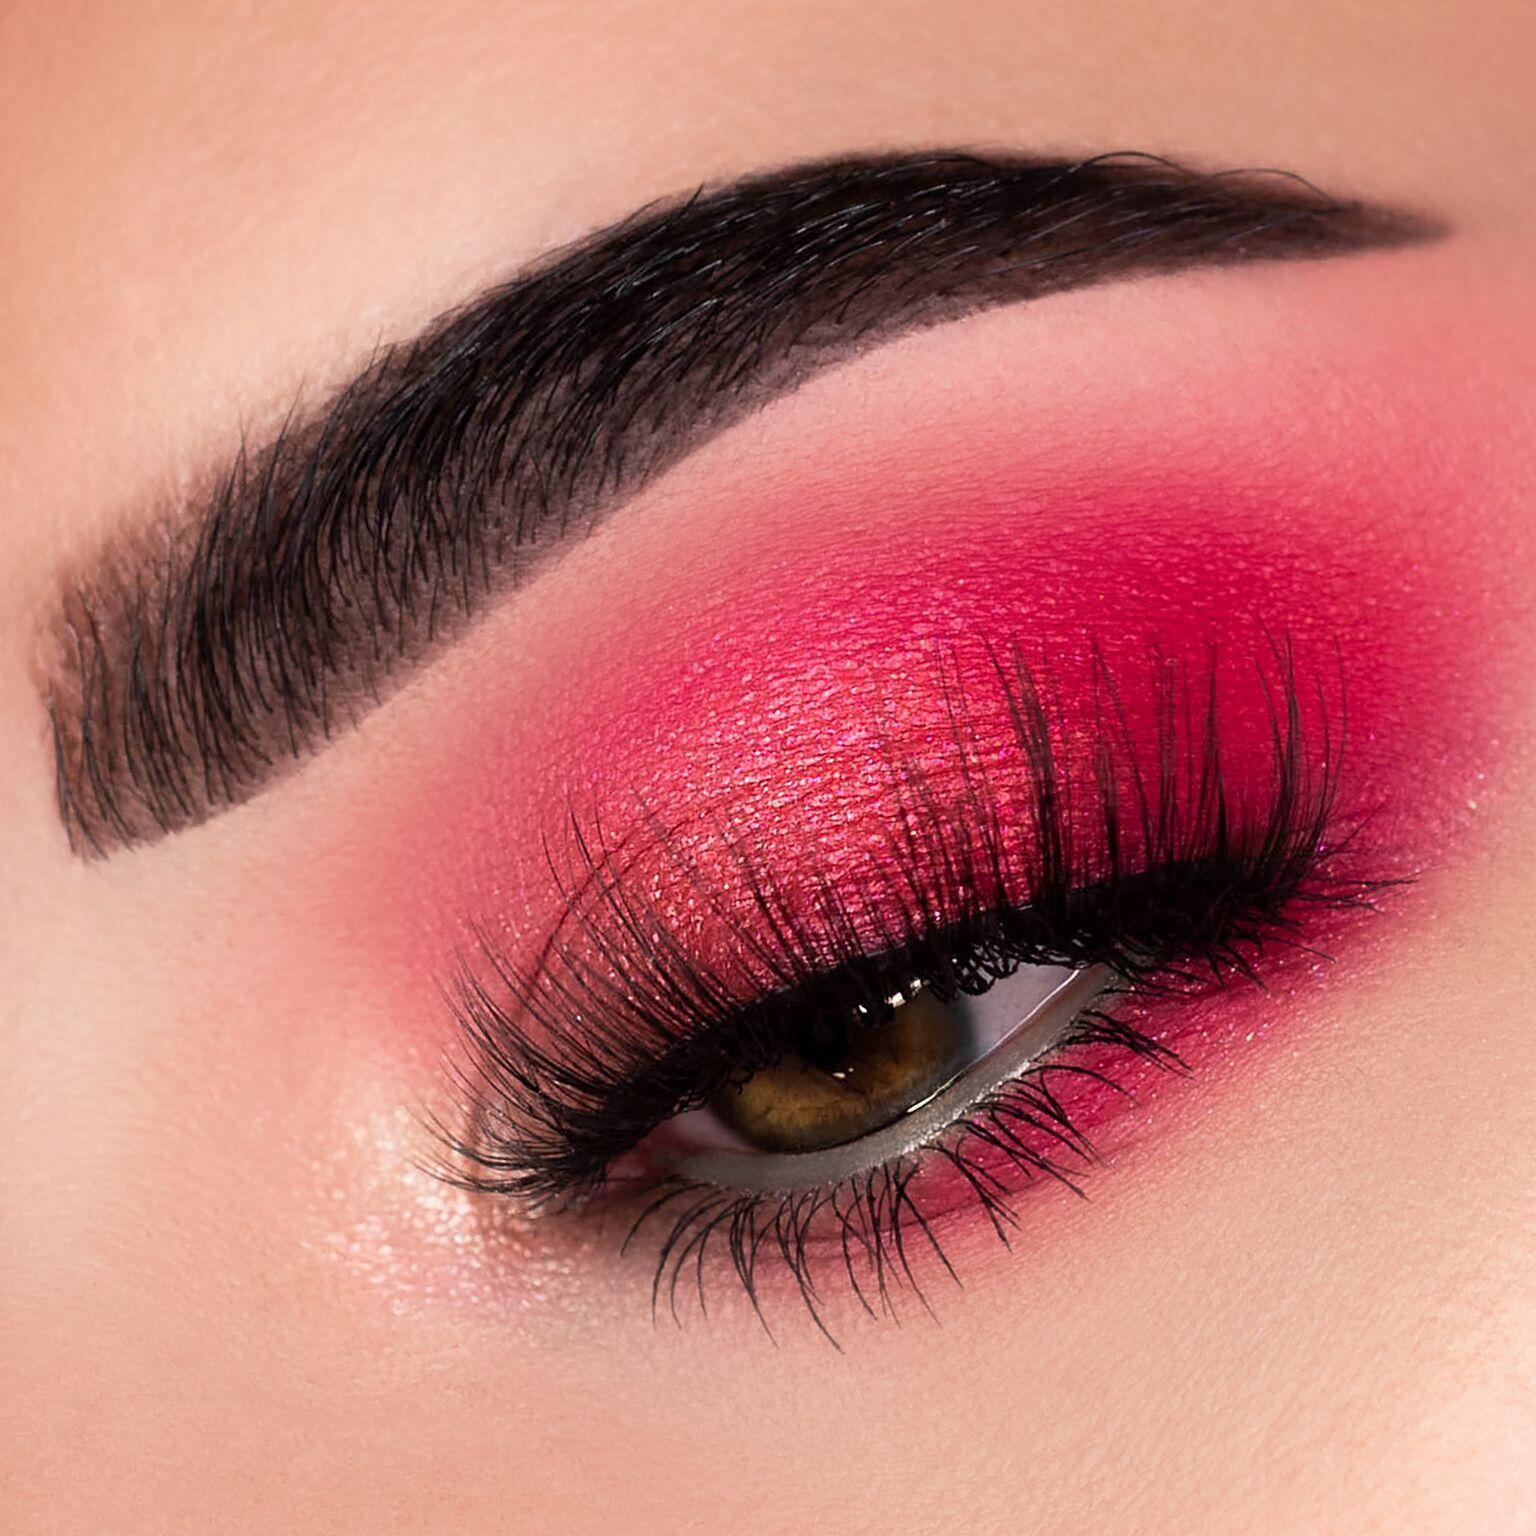 #eyeshadow #vibrant #pinkVibrant Pink Eyeshadow   Artistry ...